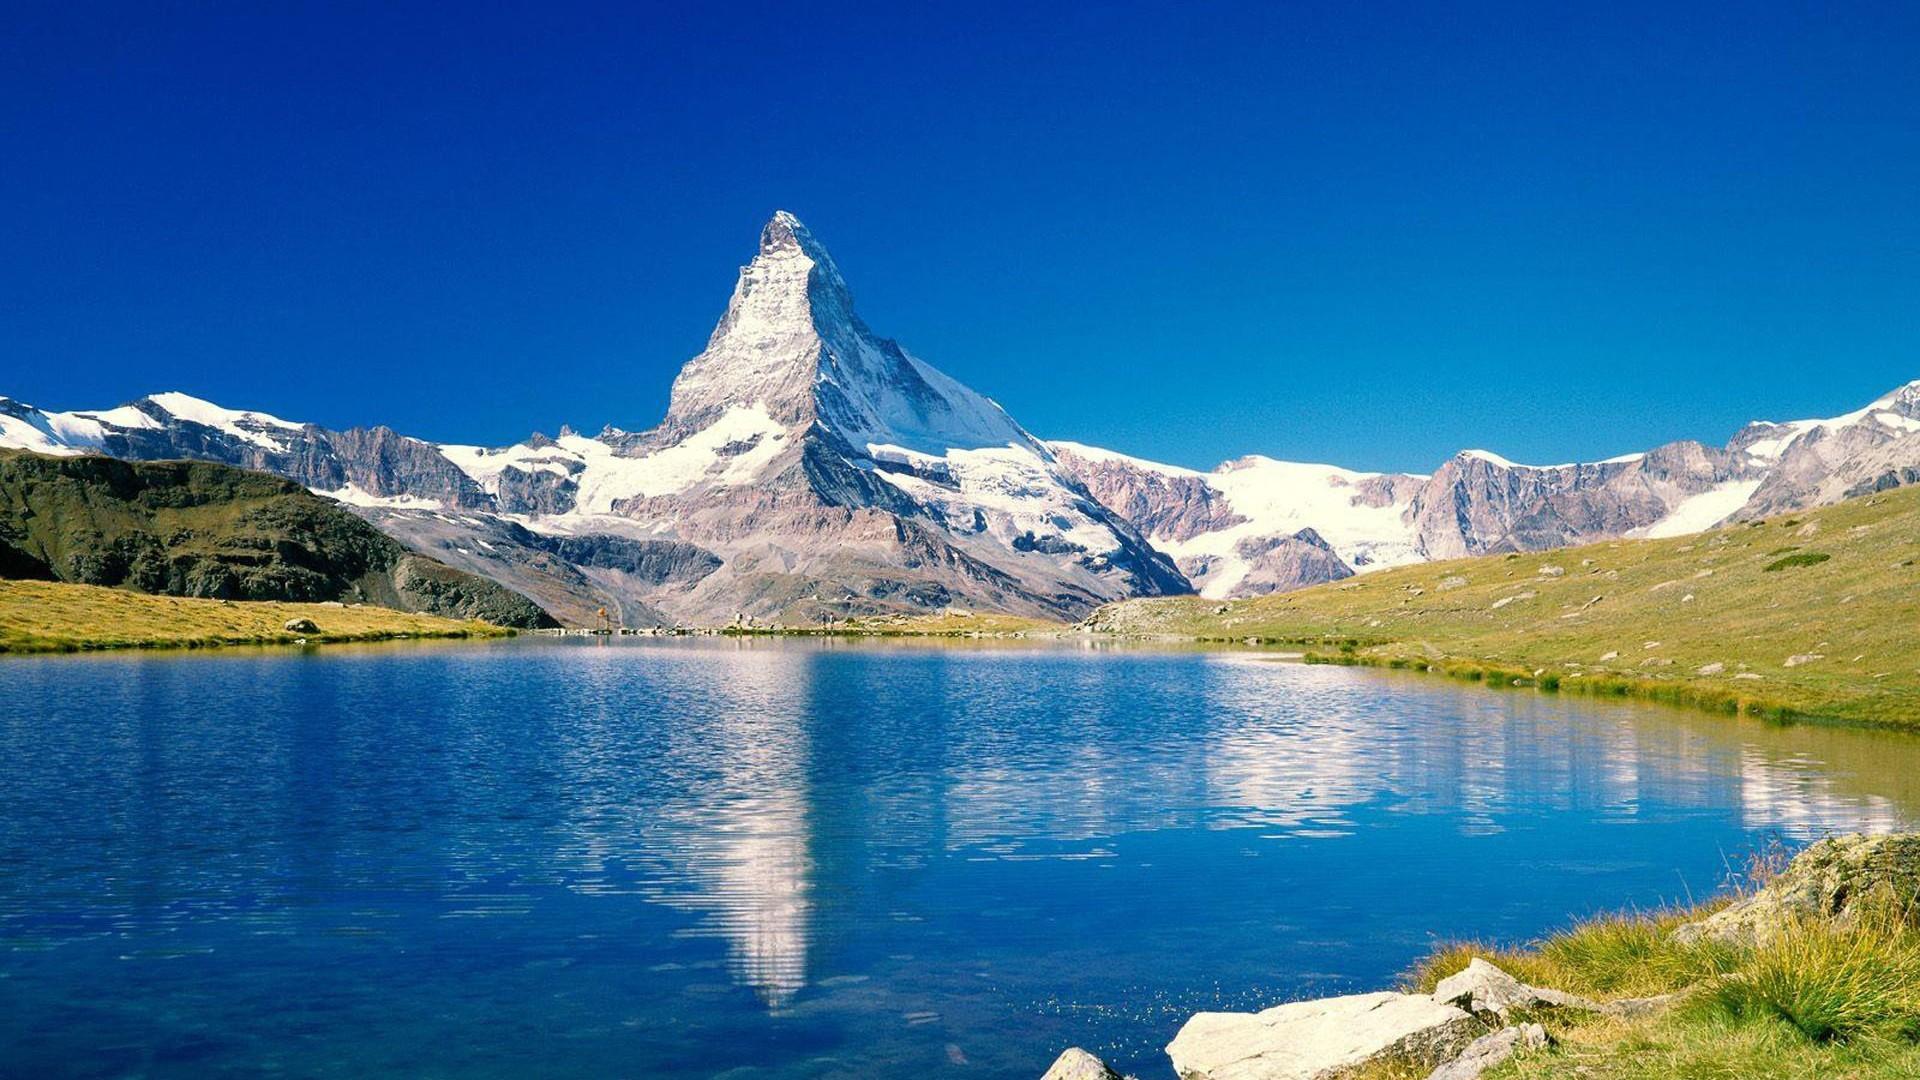 1080P HD Mountain Wallpaper, 39+ HD 1080P Mountain Wallpapers .